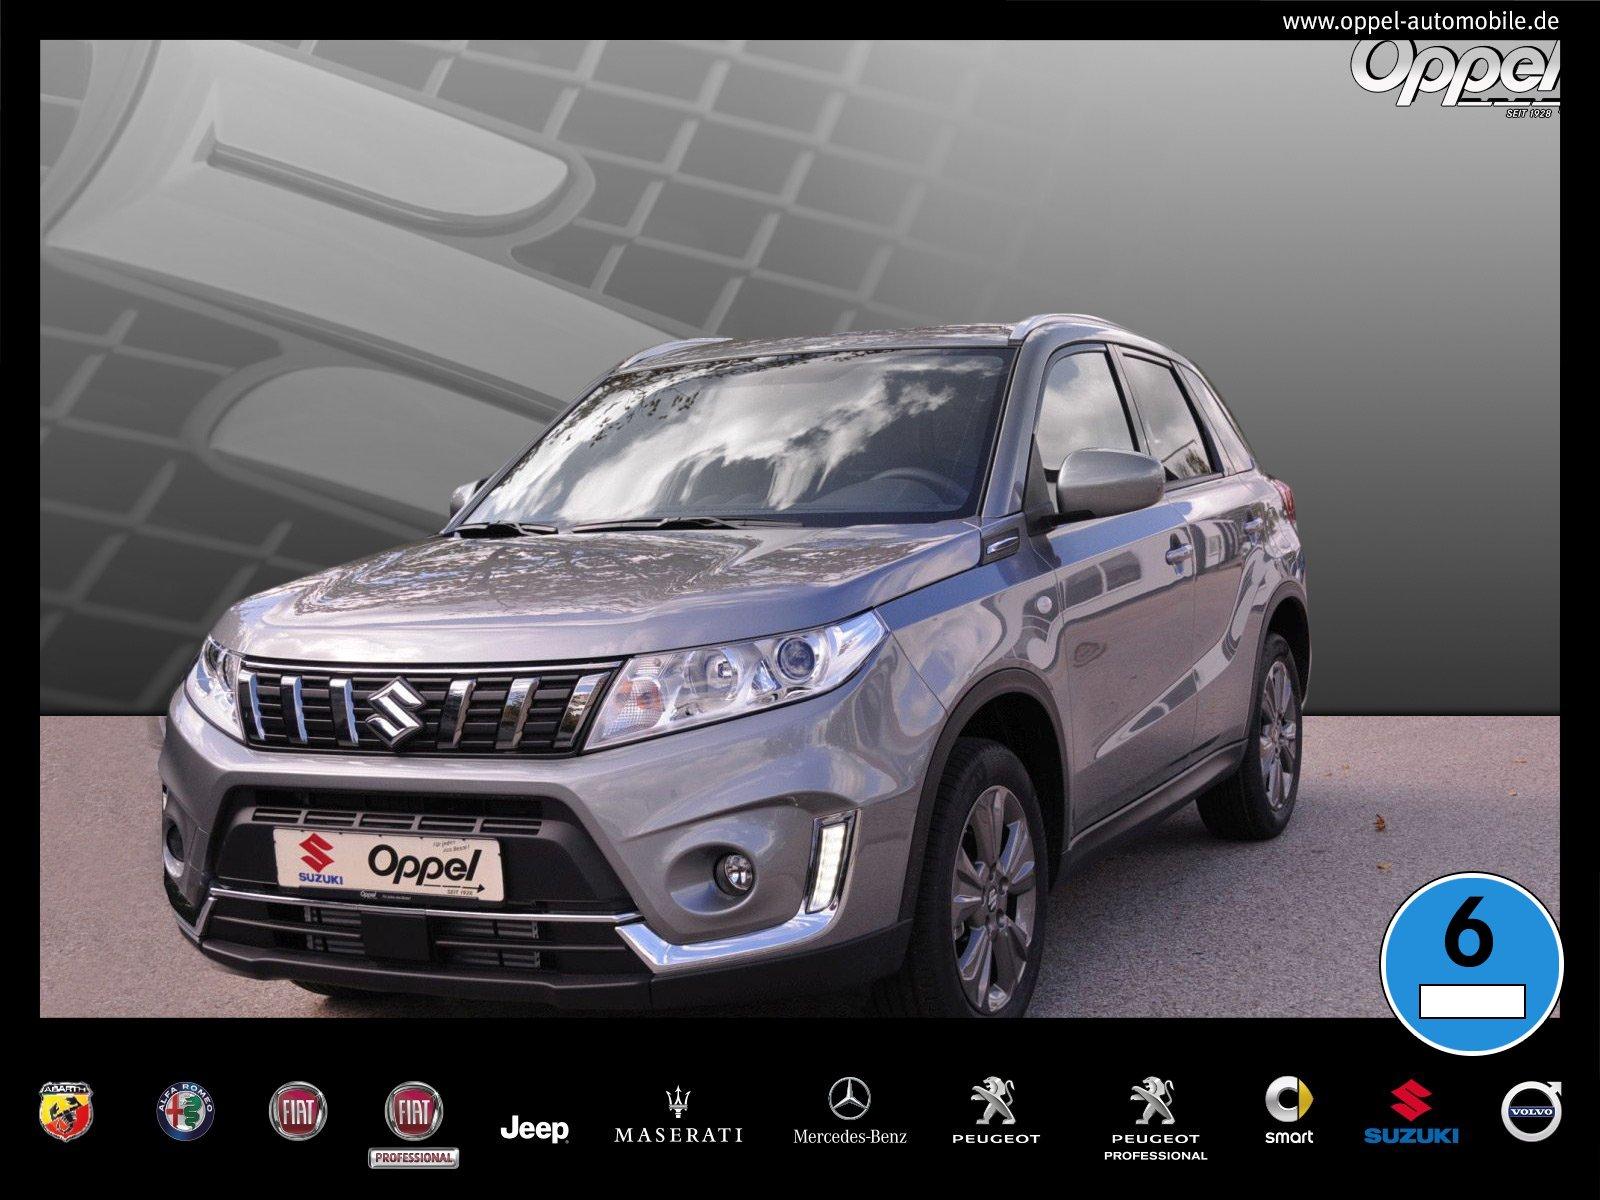 Suzuki Vitara 1.0 Comfort RÜCKFAHRK+SITZH+LED+TEMPOMAT, Jahr 2019, Benzin